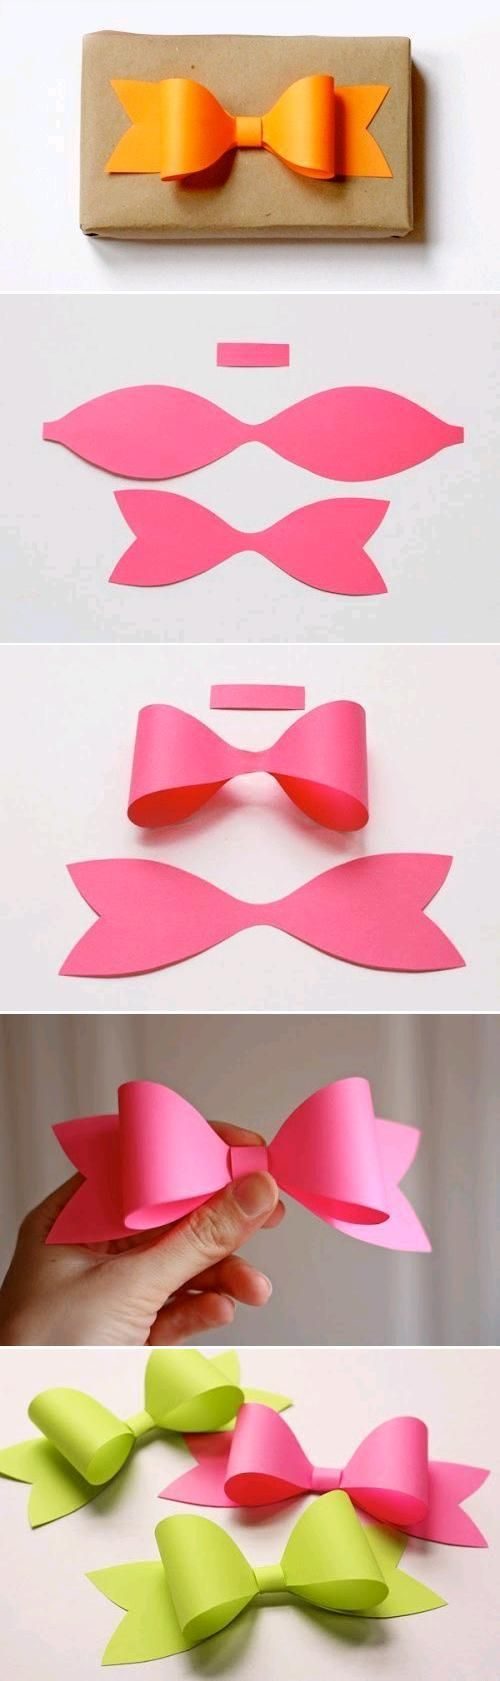 Uncategorized Tying Ribbon best 25 ribbon bows ideas on pinterest bow diy and pinwheel bow